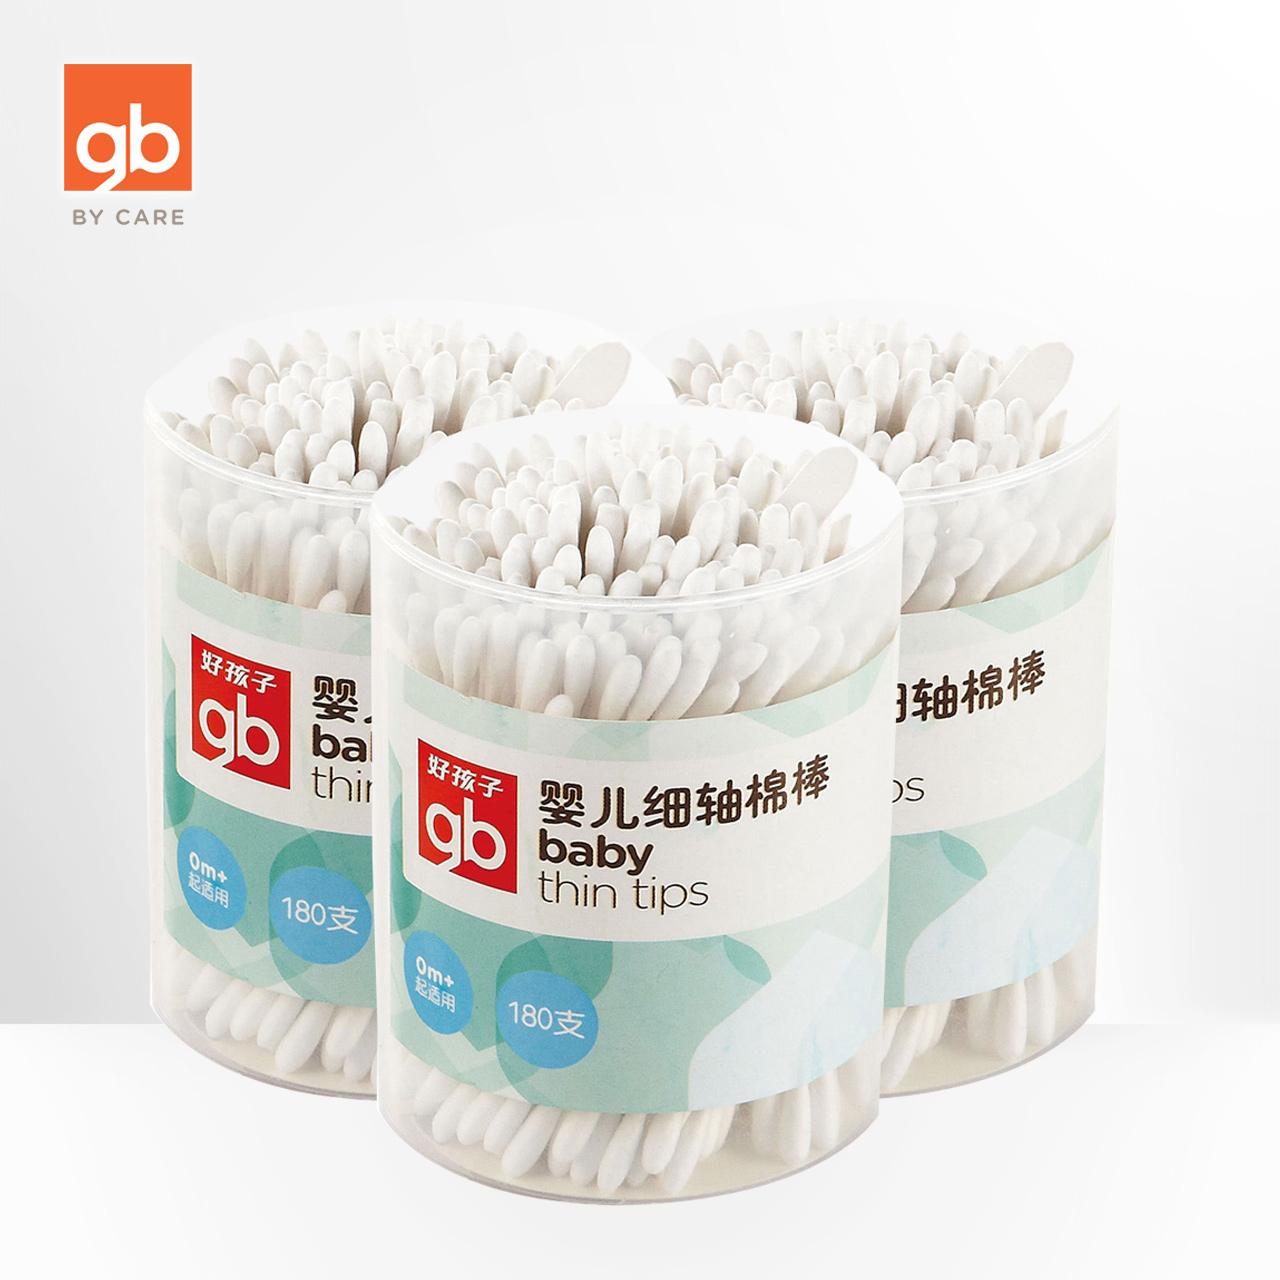 gb好孩子嬰兒寶寶兒童 細軸棉棒棉簽純棉 180支3件裝棉花棒